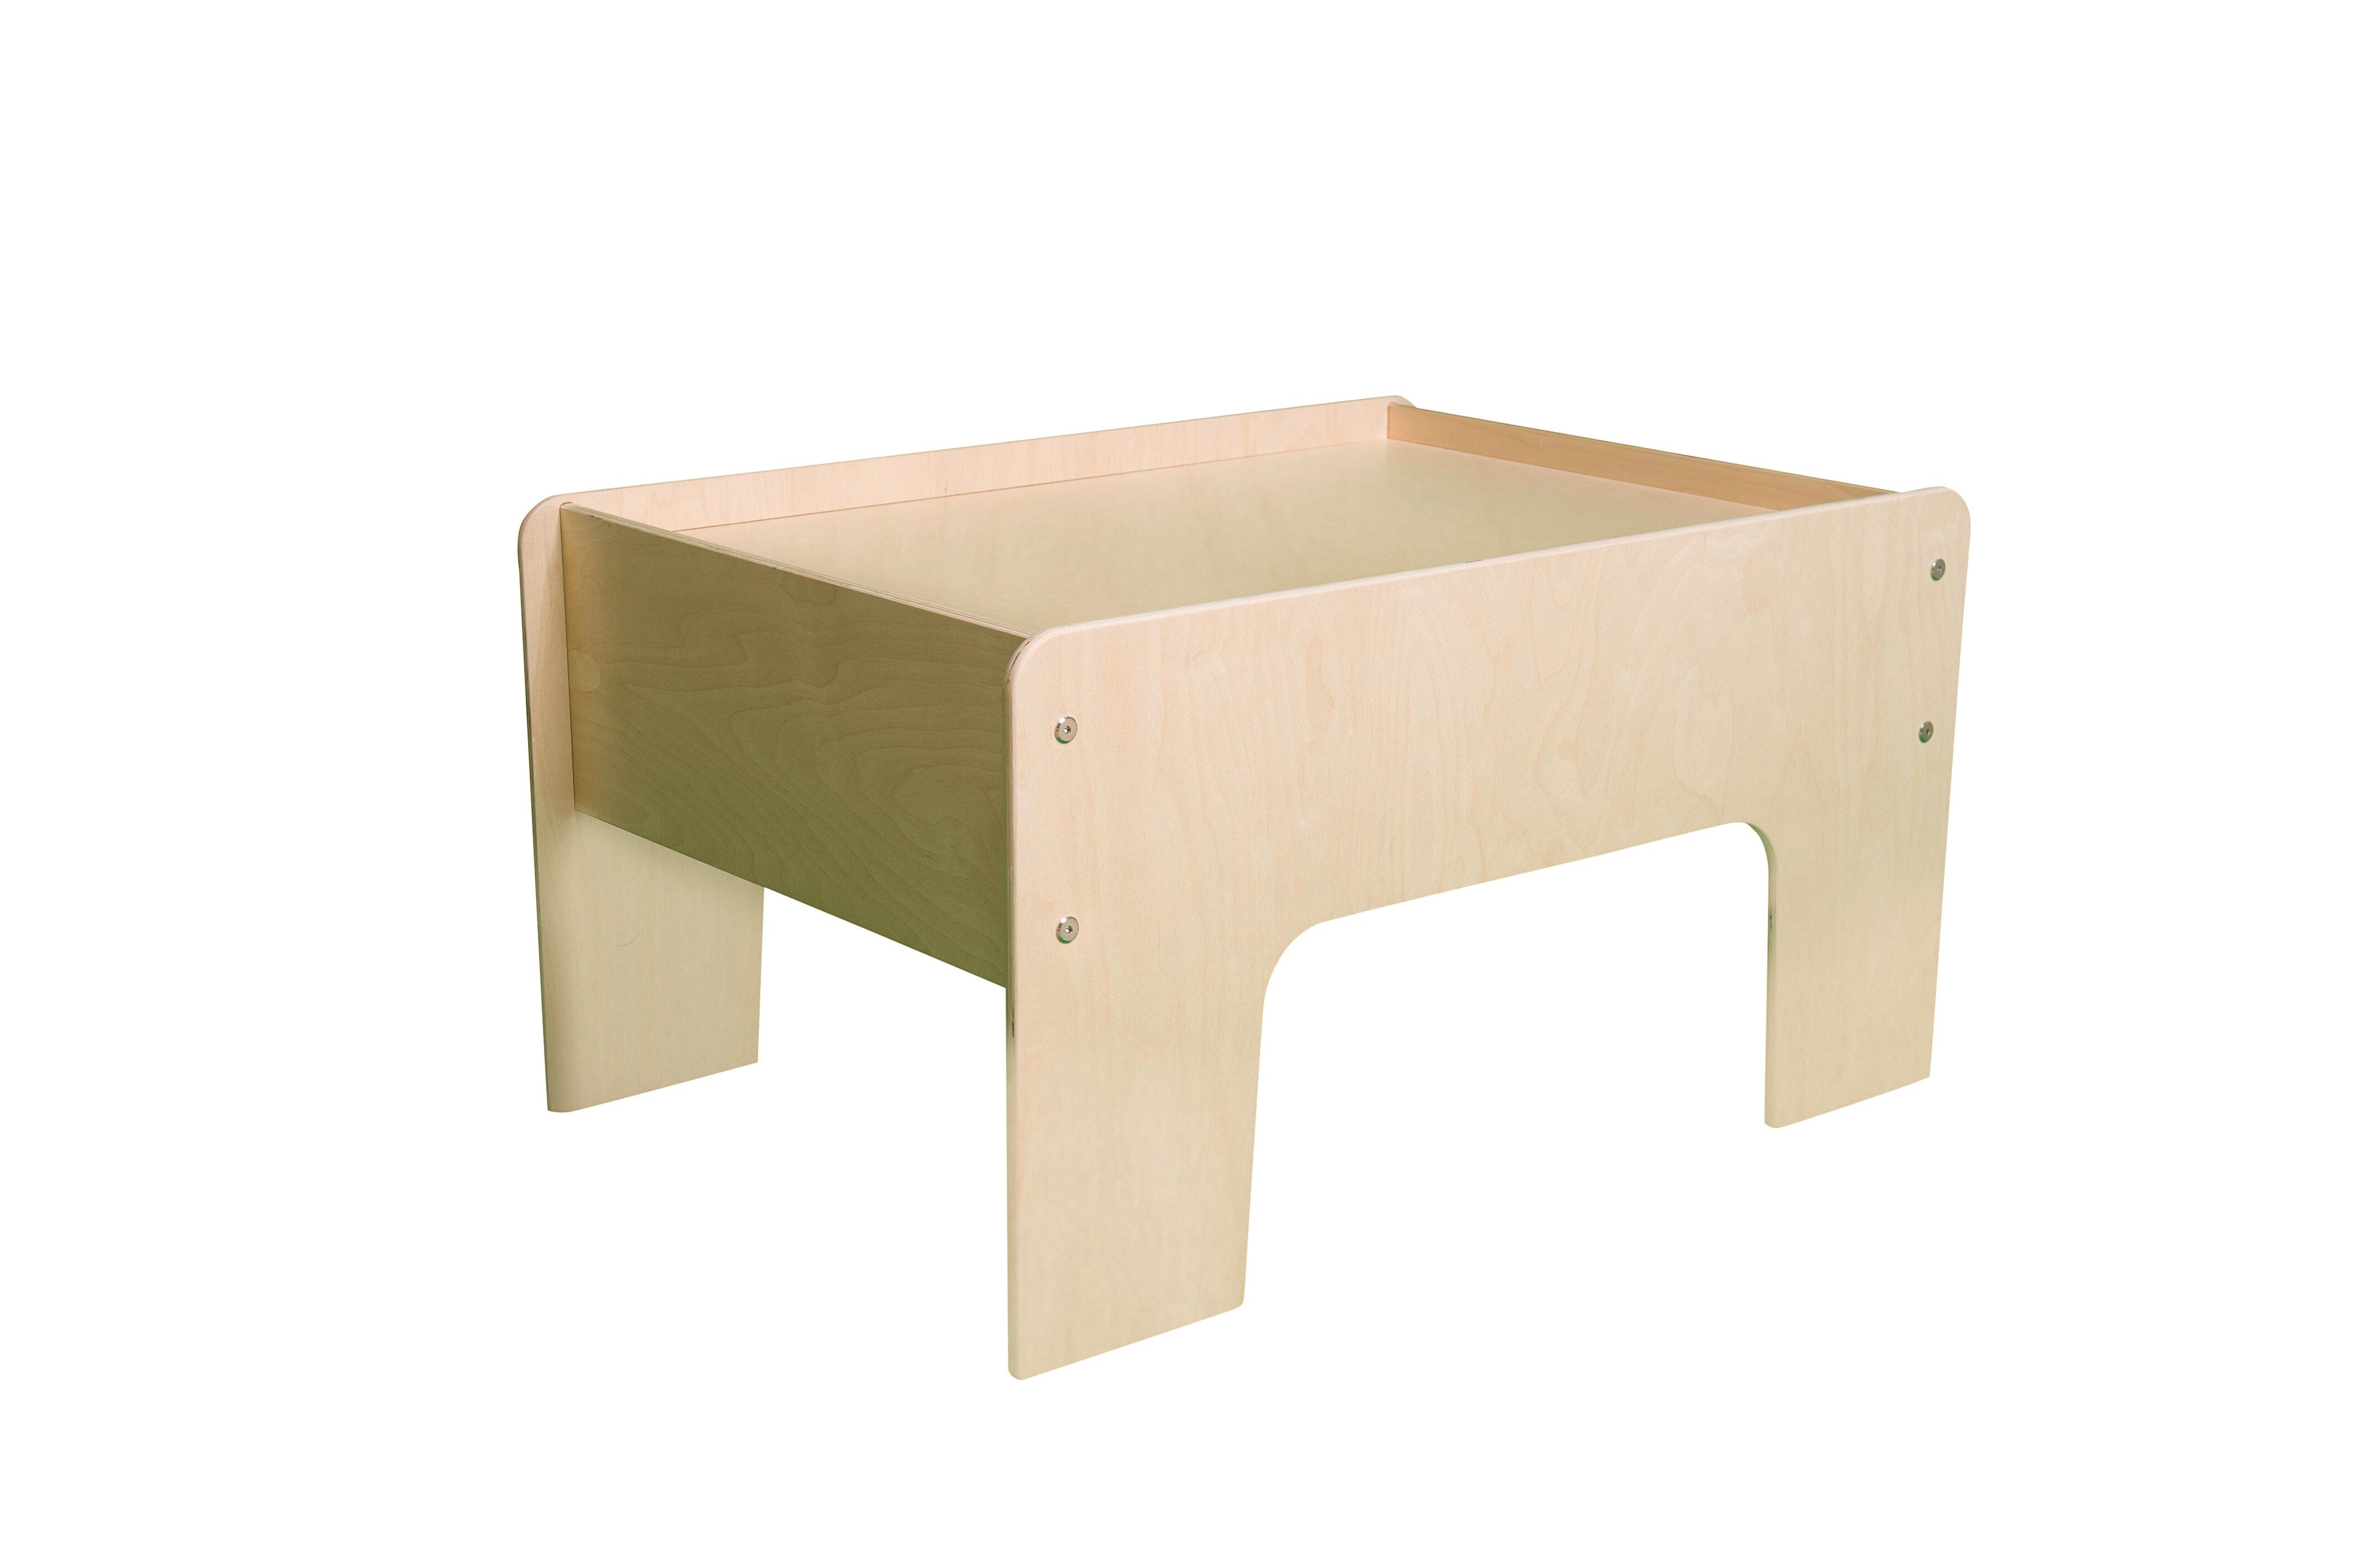 Terrific Torquay Kids Rectangular Train Table Creativecarmelina Interior Chair Design Creativecarmelinacom